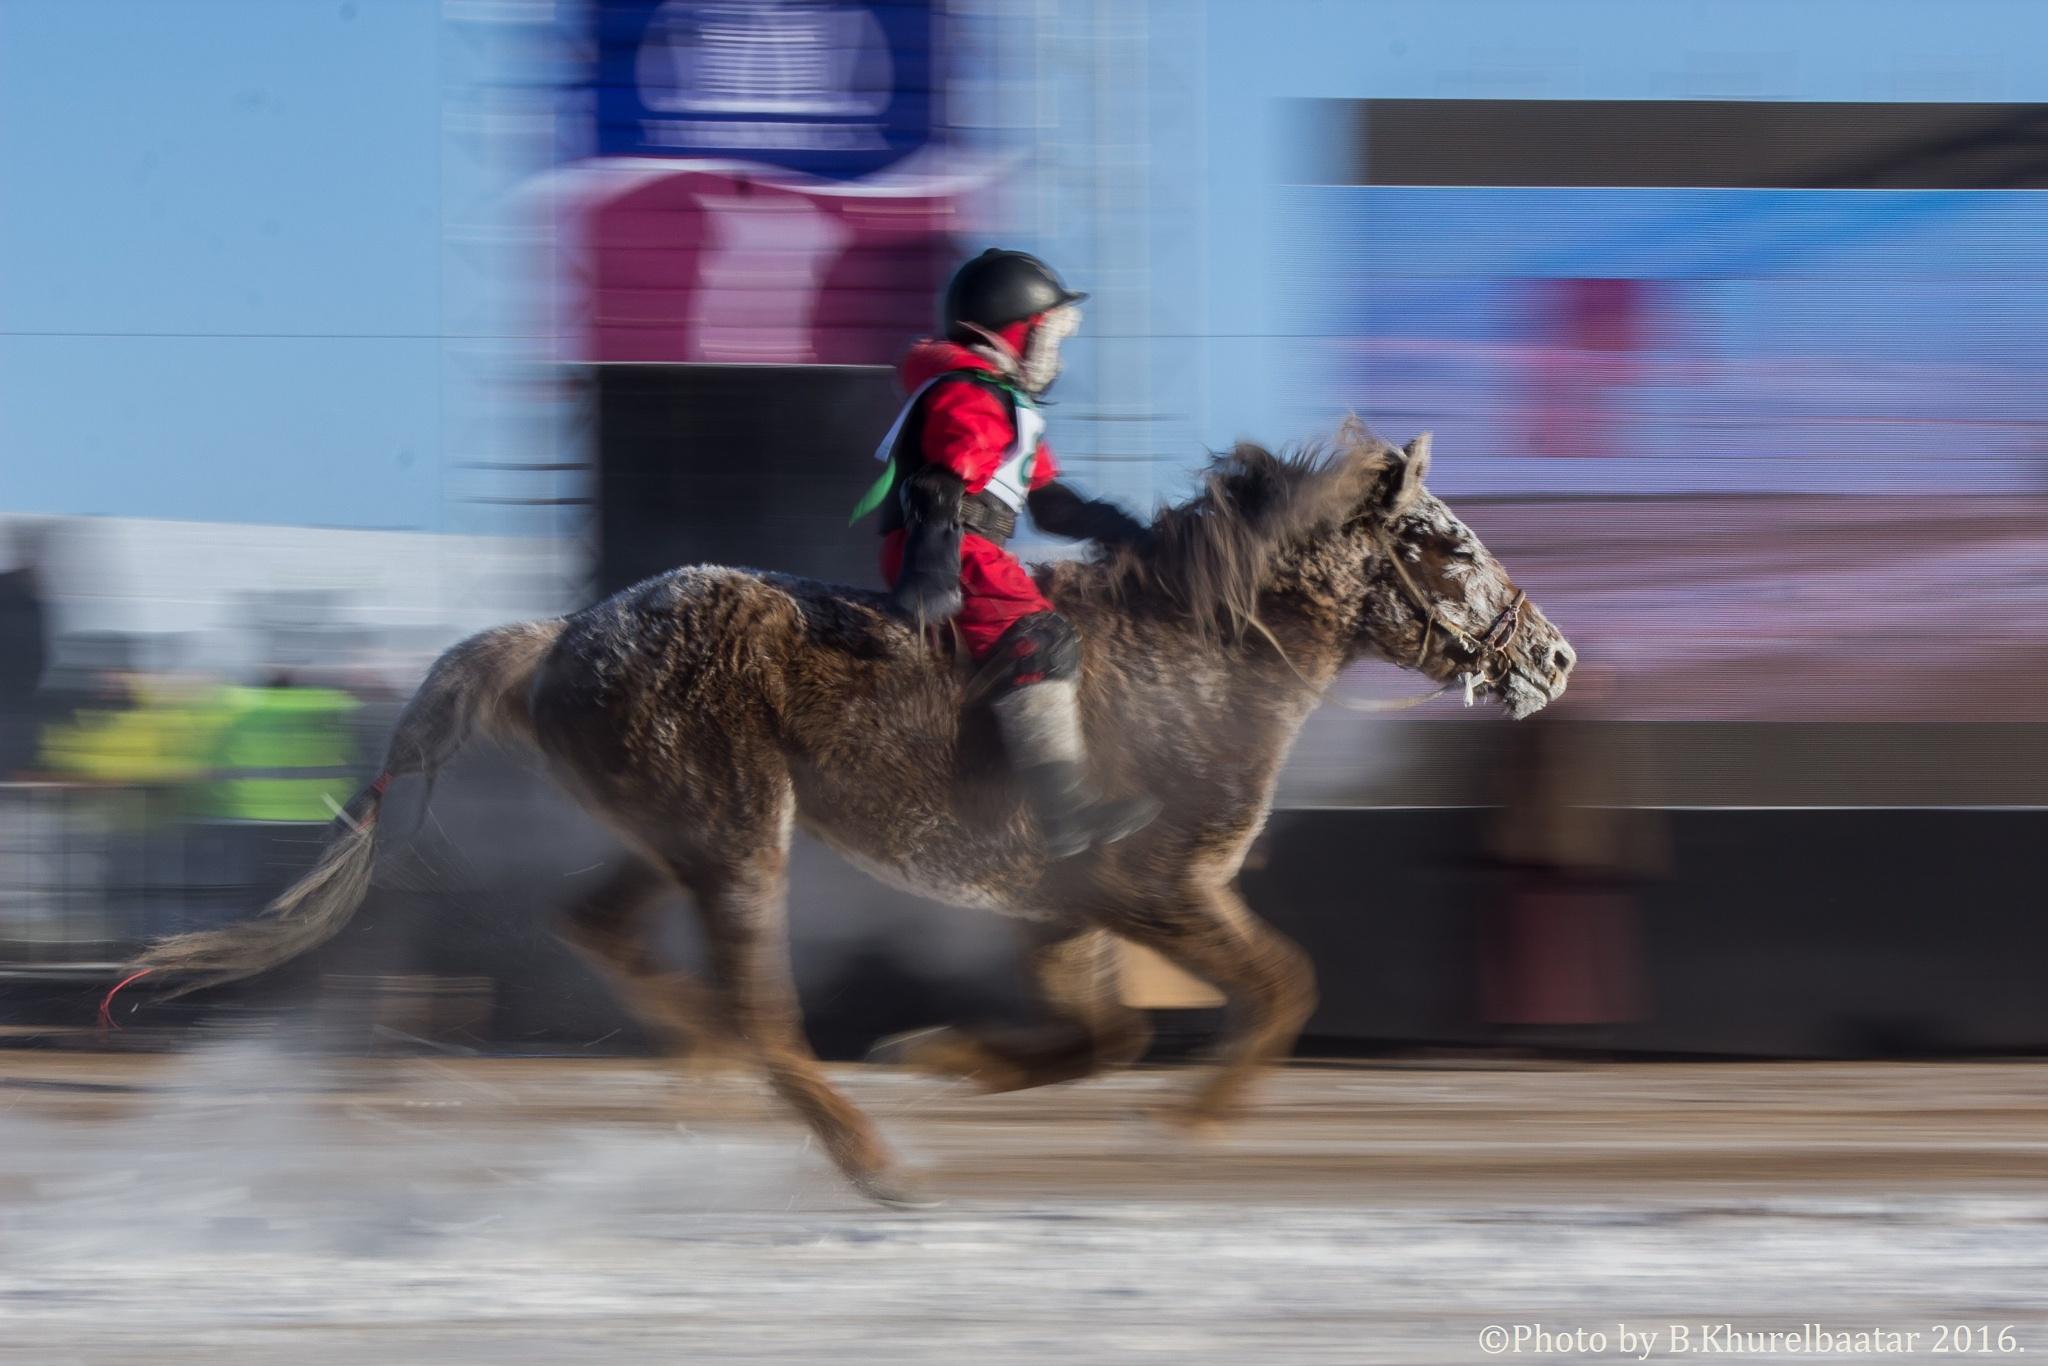 Horse racing of Mongolia by Khurelbaatar Batsvh